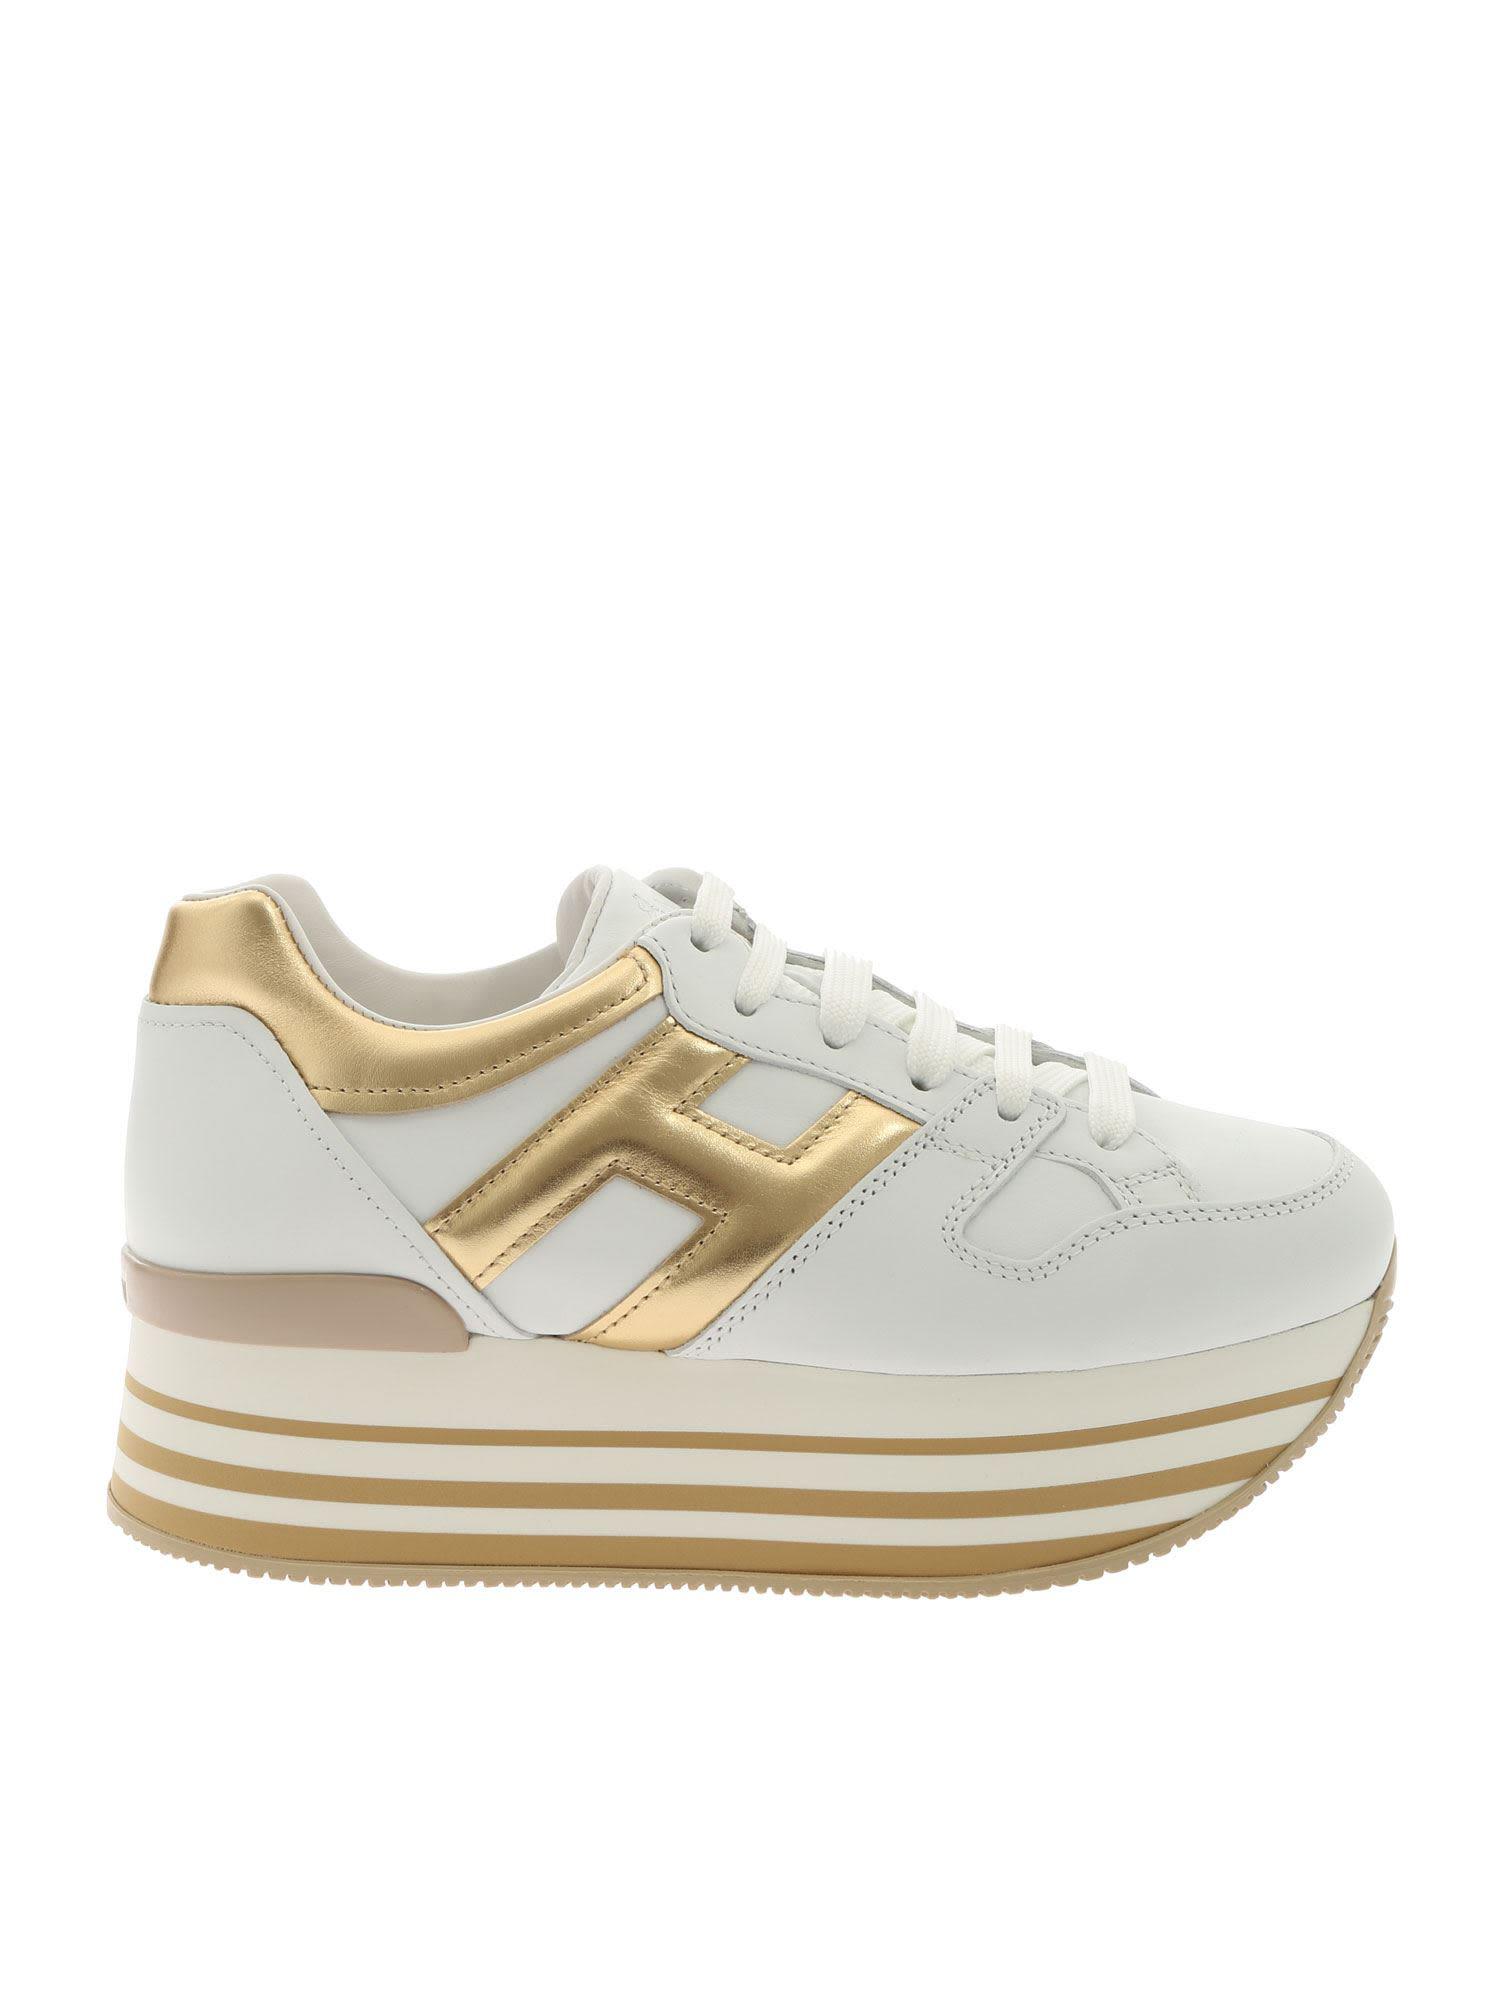 Hogan Maxi H222 Platform Sneakers In White/gold   ModeSens